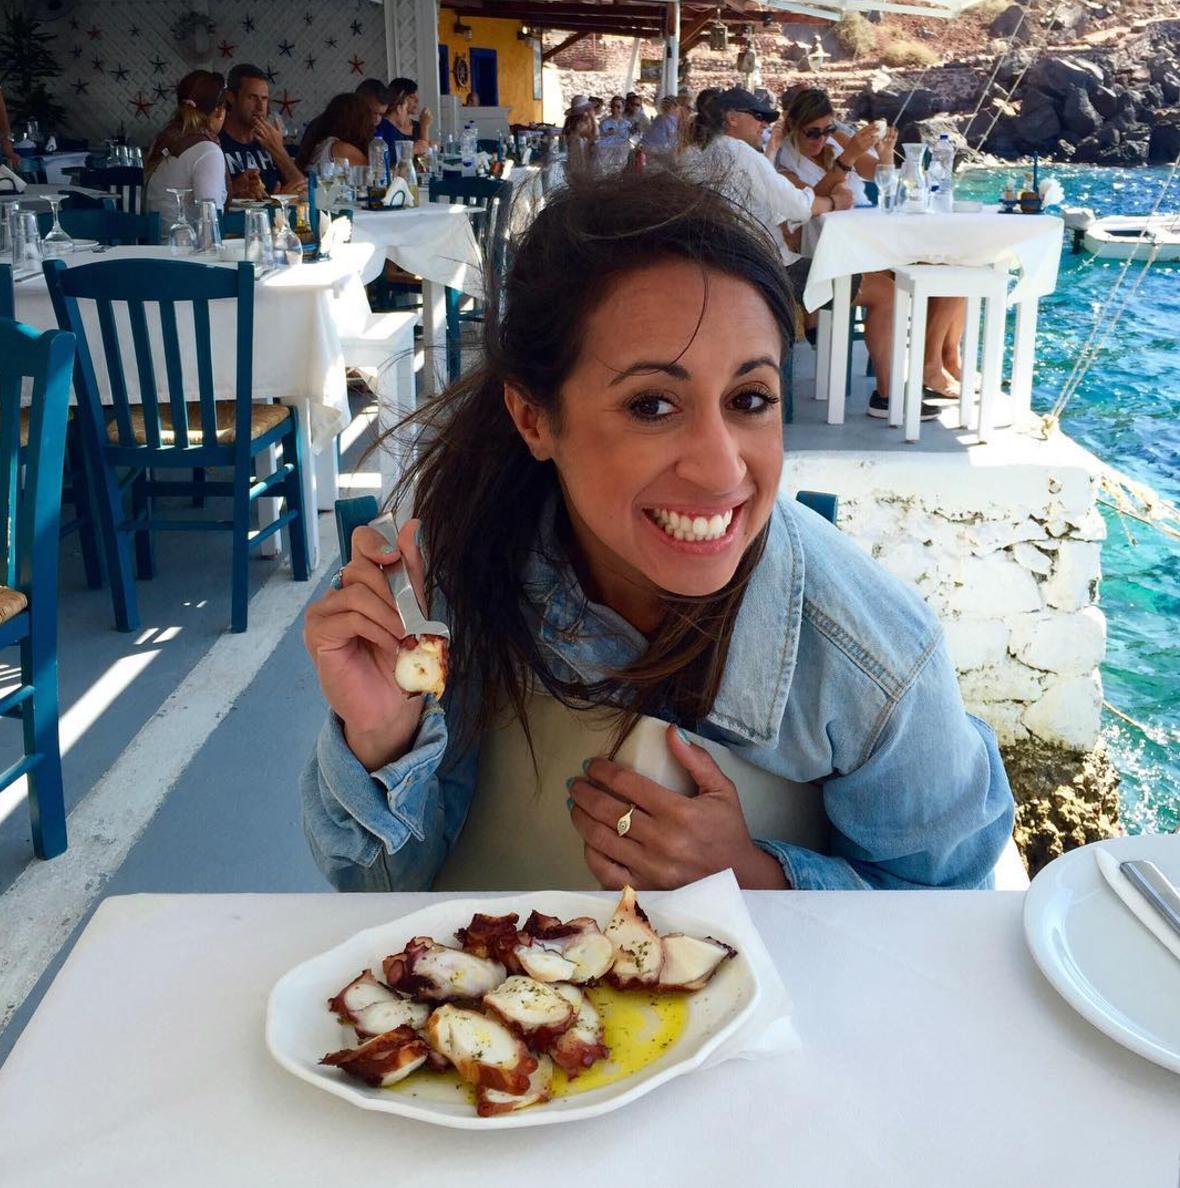 Eating octopus for the first time in Santorini (September 2016)